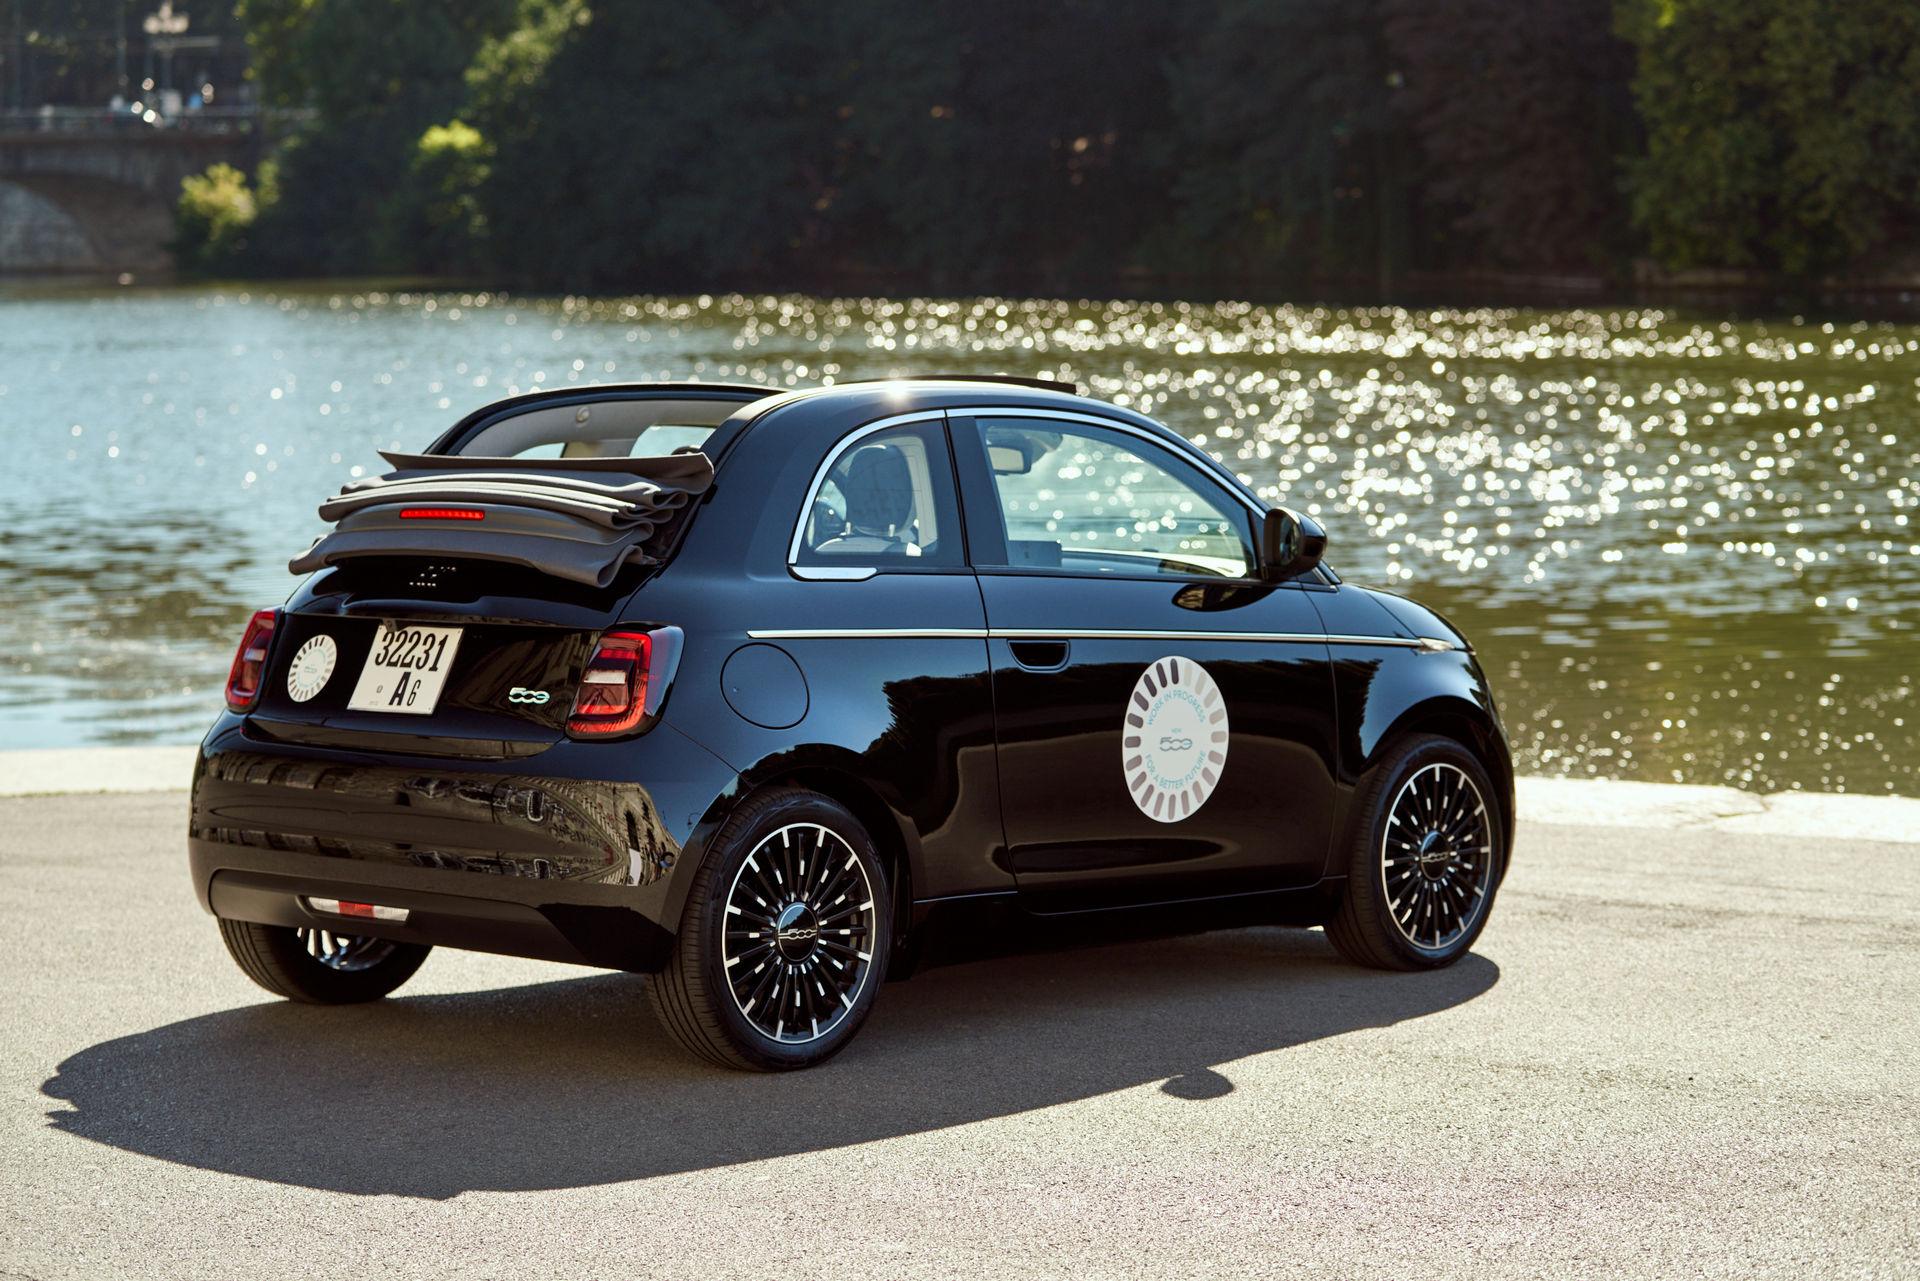 Fiat 500 Electric